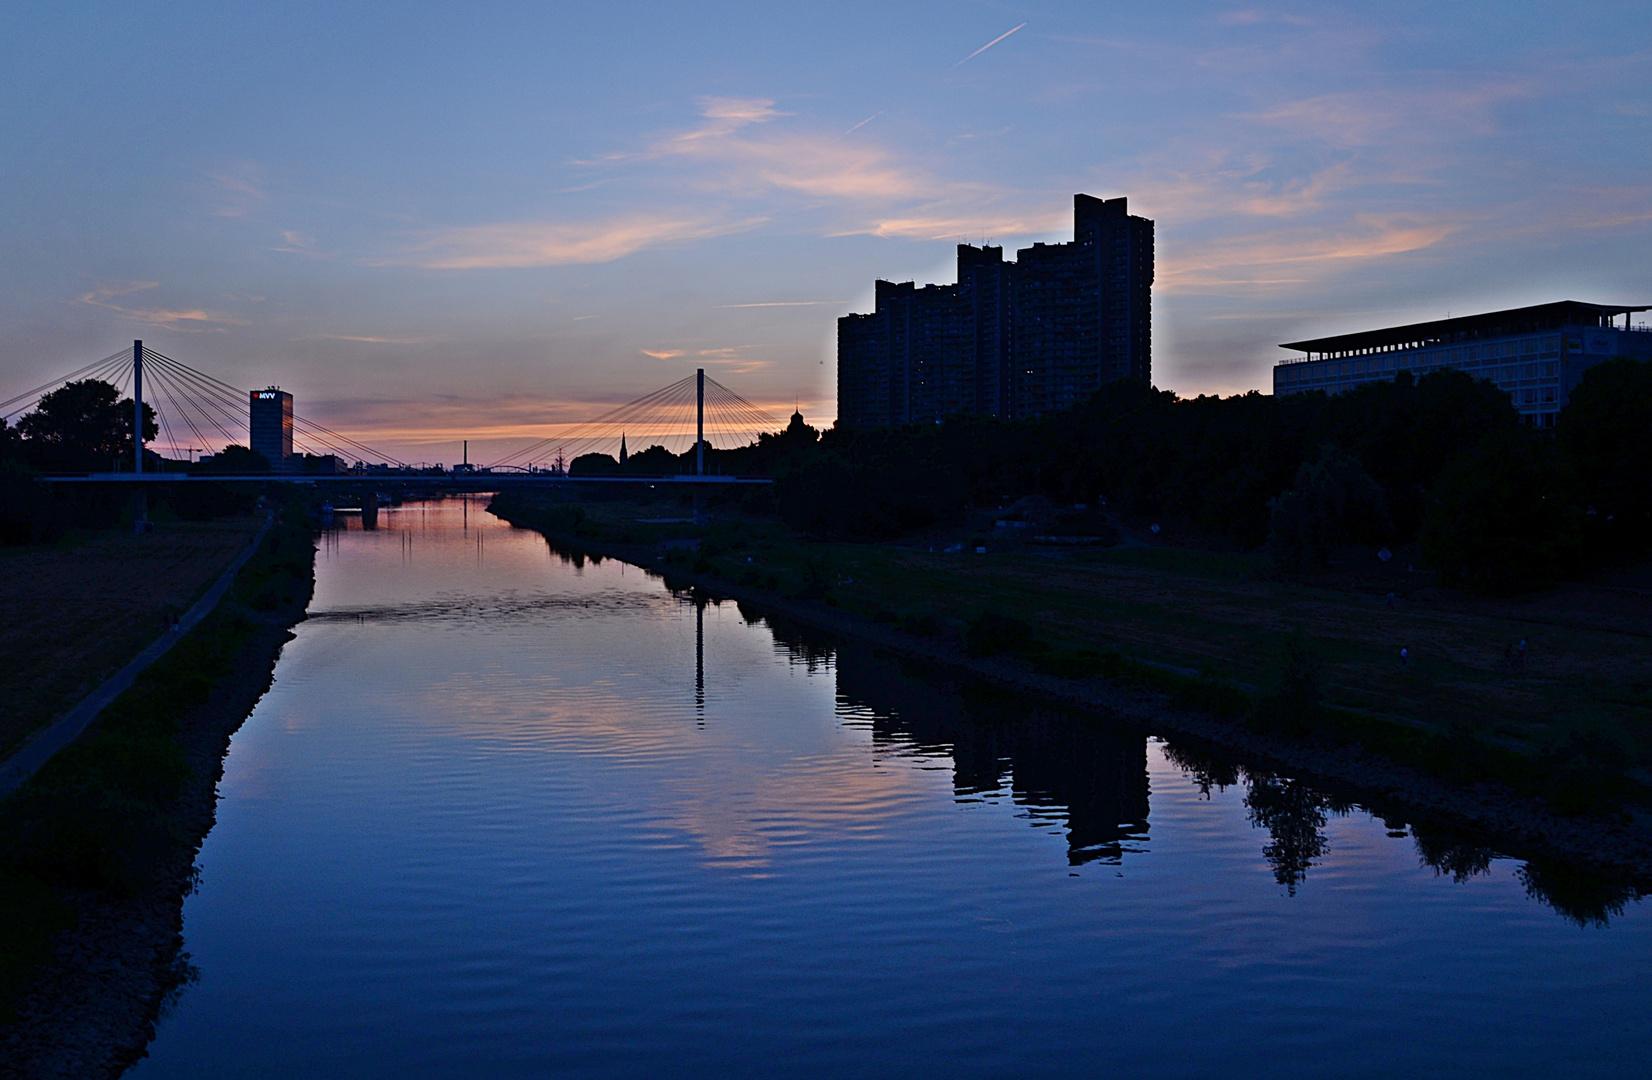 Silhouette am Neckar